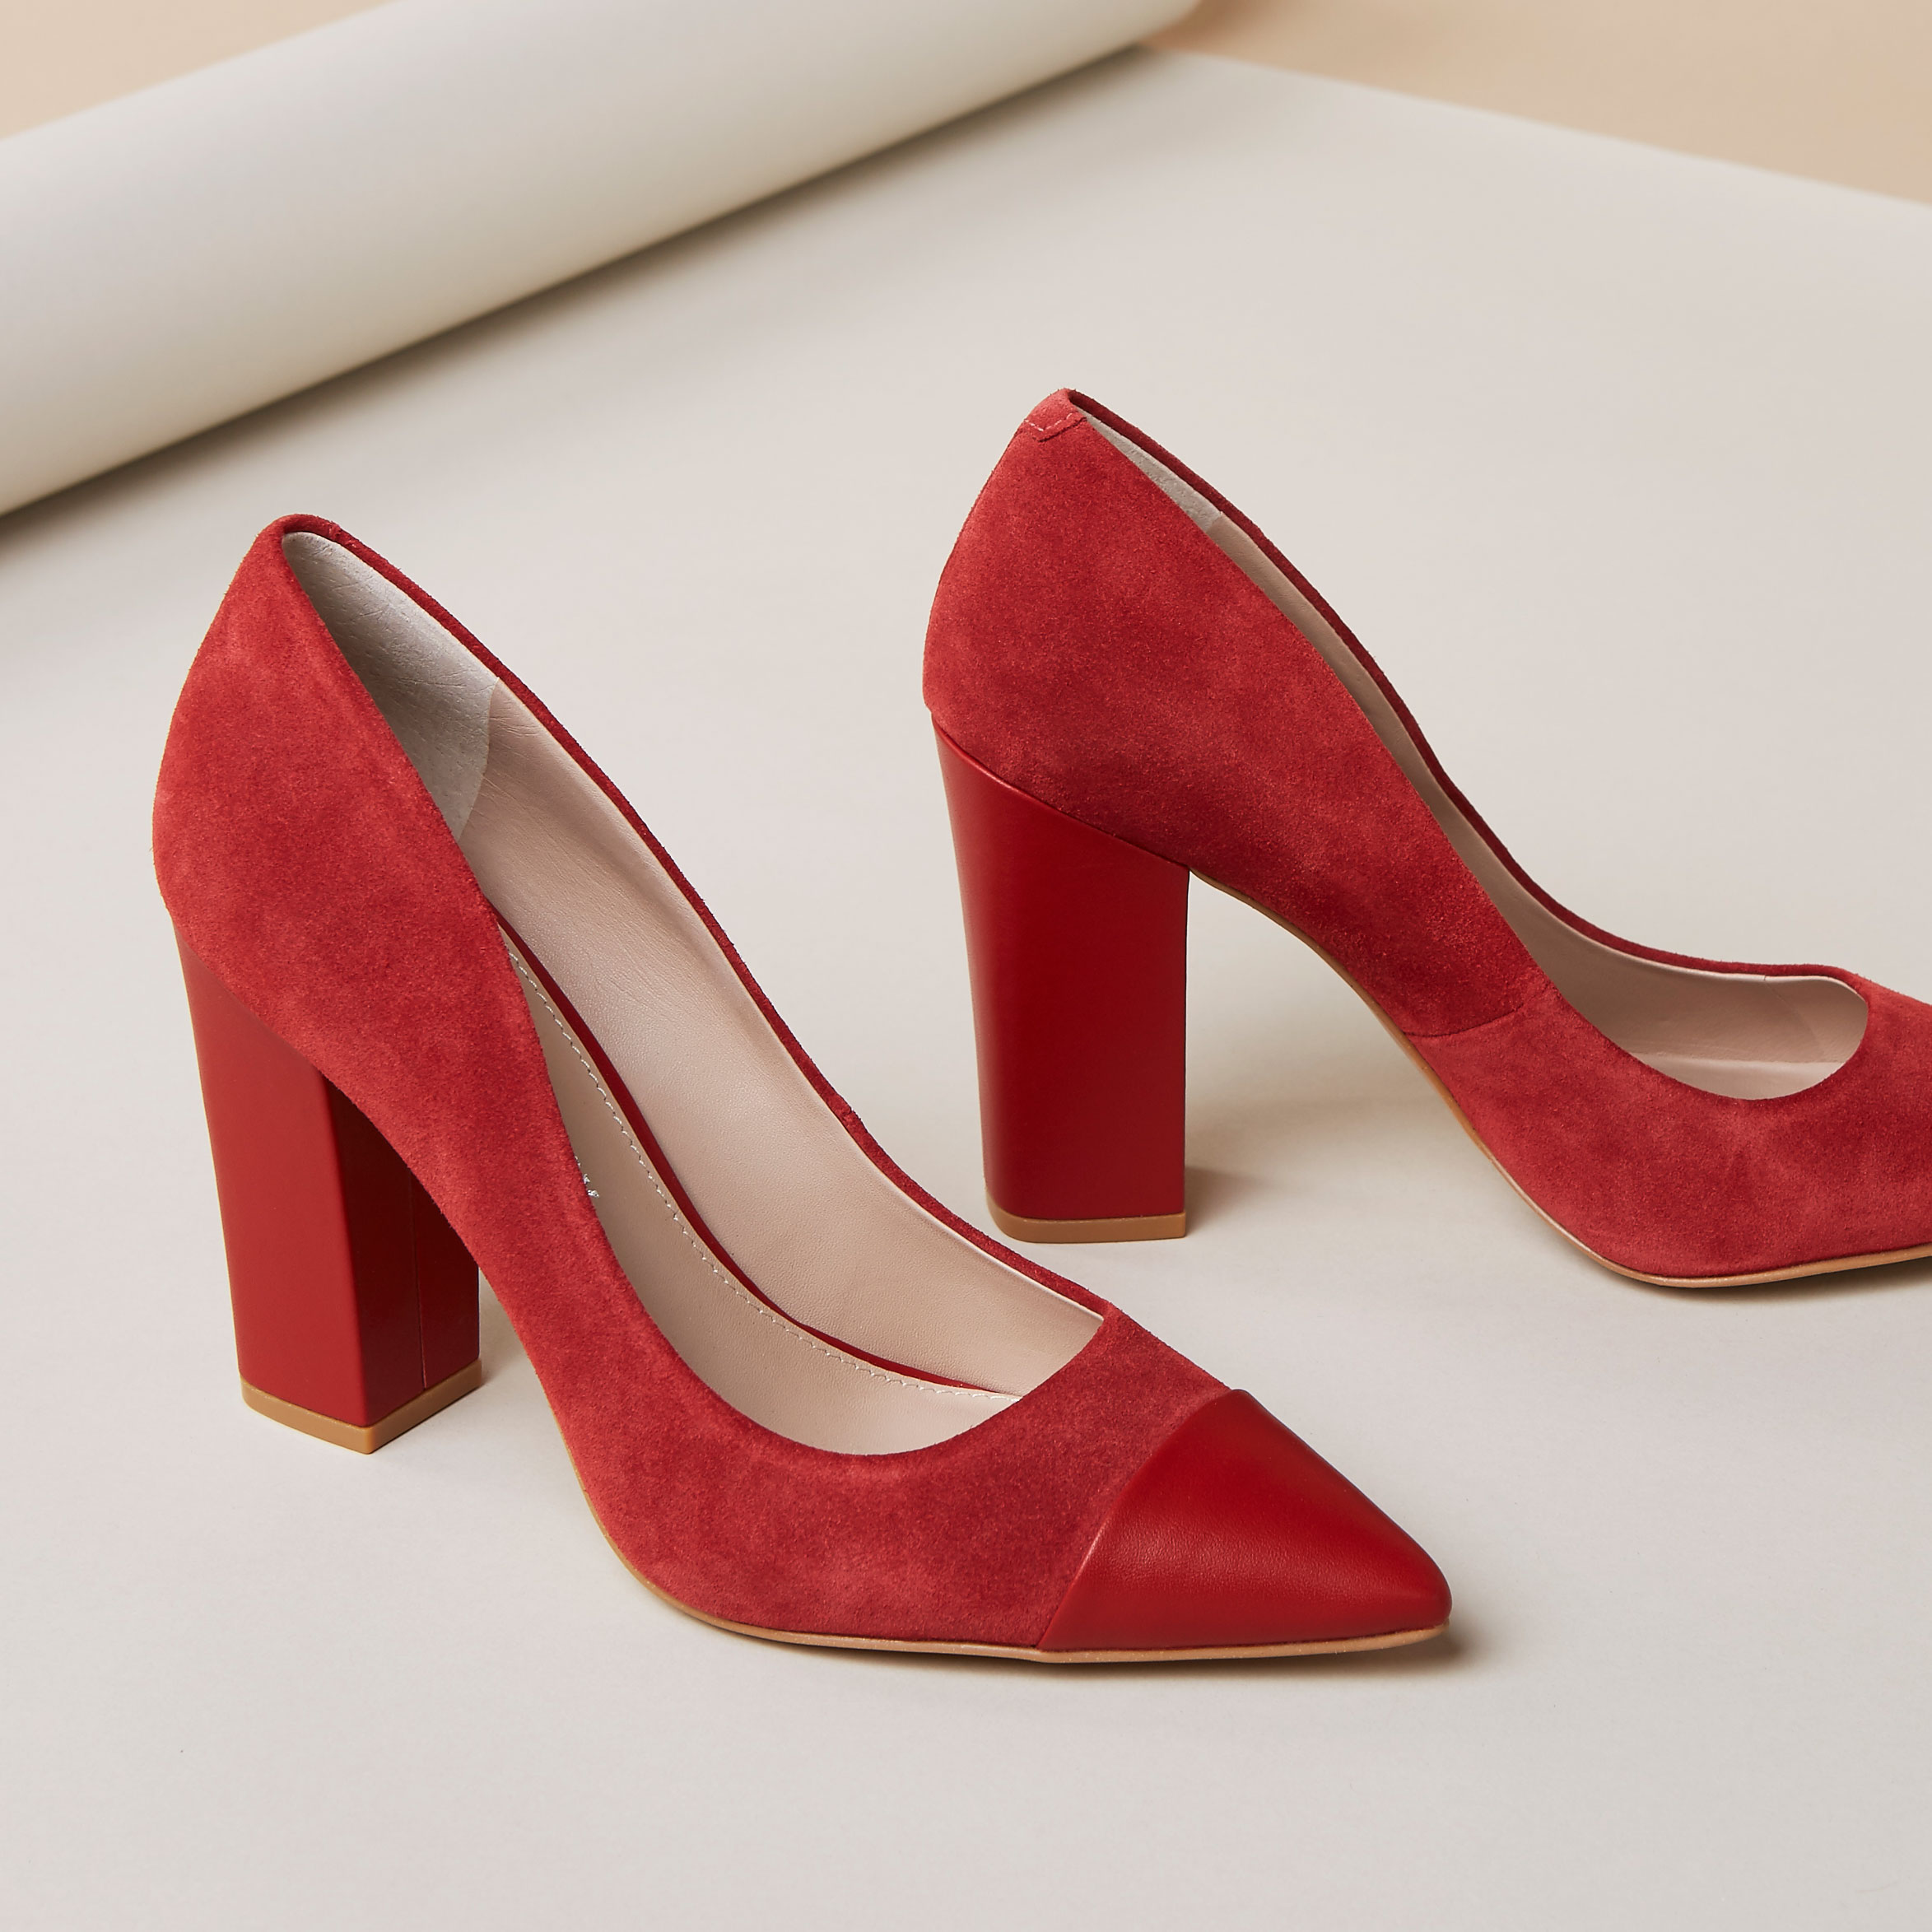 1Shoe4Ways_Red_Square.jpg